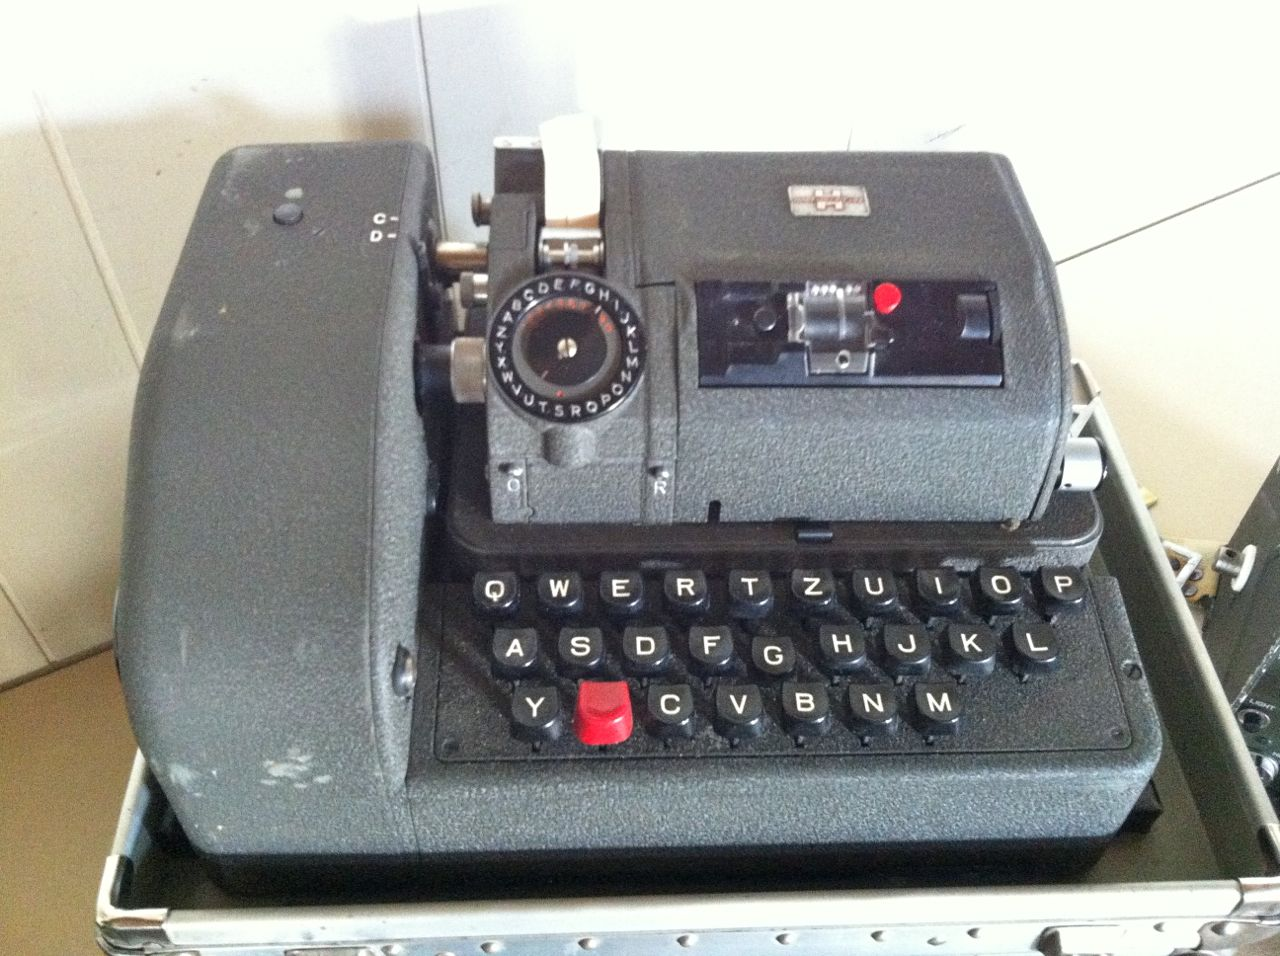 Hagelin B-52 keyboard plus CX-52 cipher machine